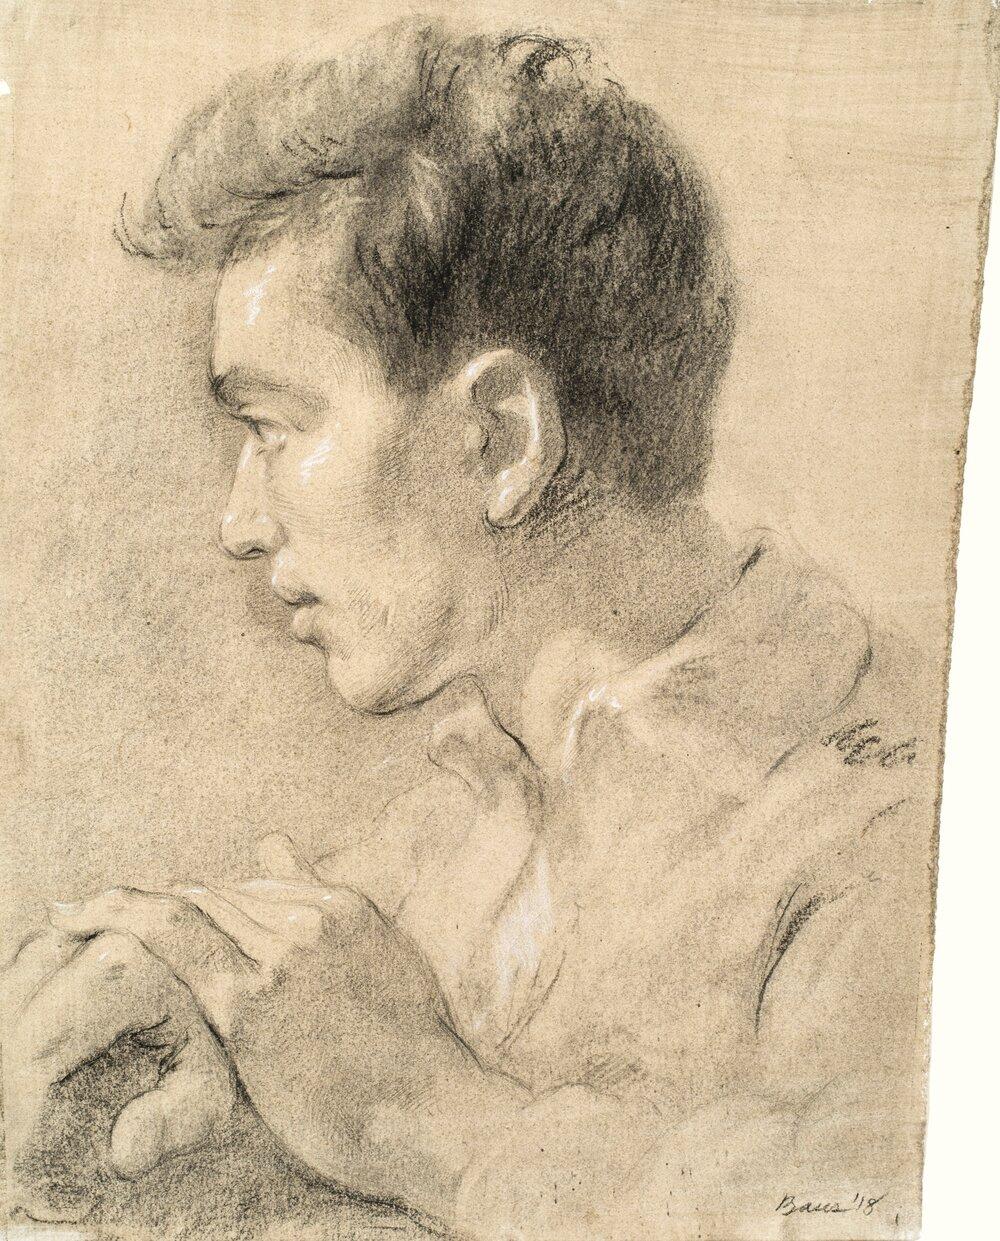 Portrait of a Boy in Profile, 2018